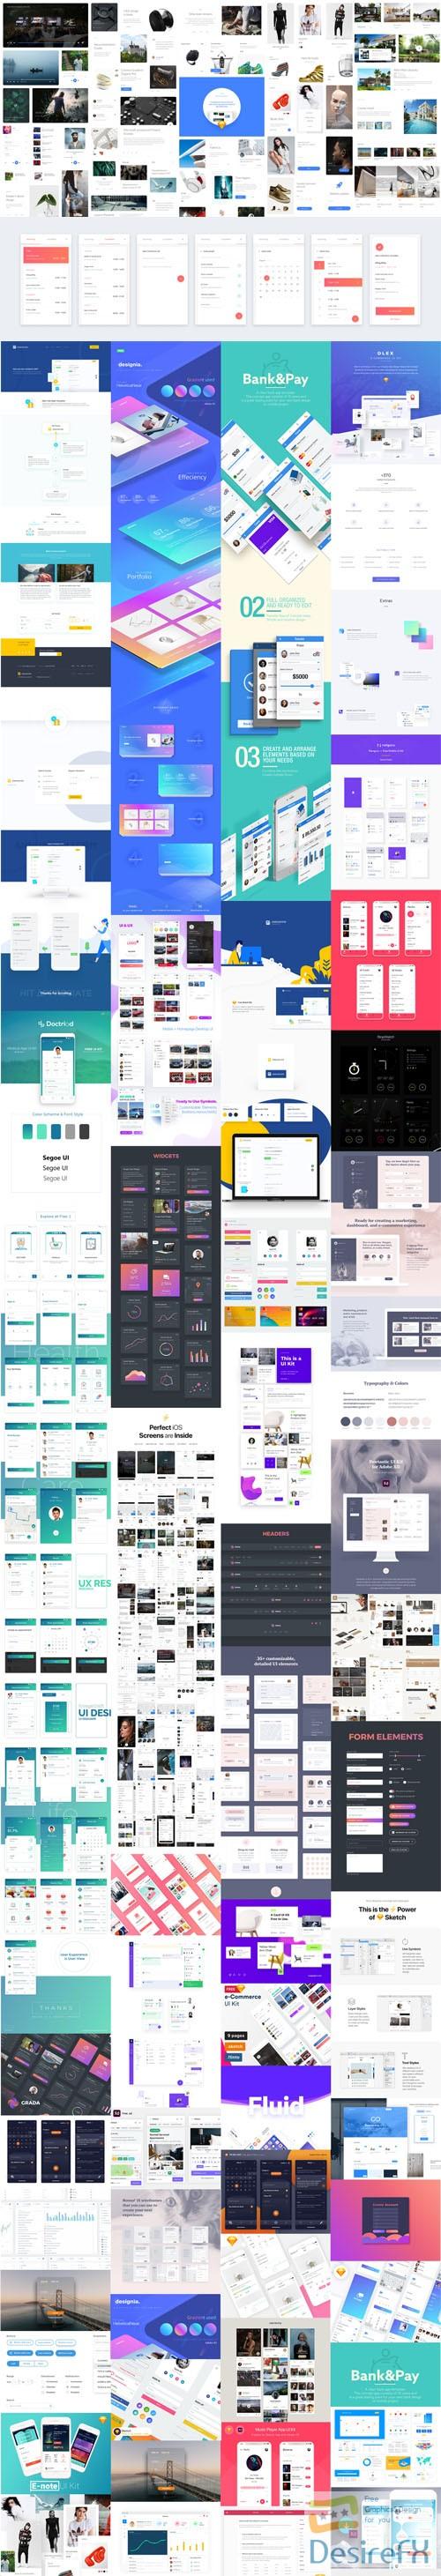 photoshop - 50+ Best UI Design Kits of 2017-2018